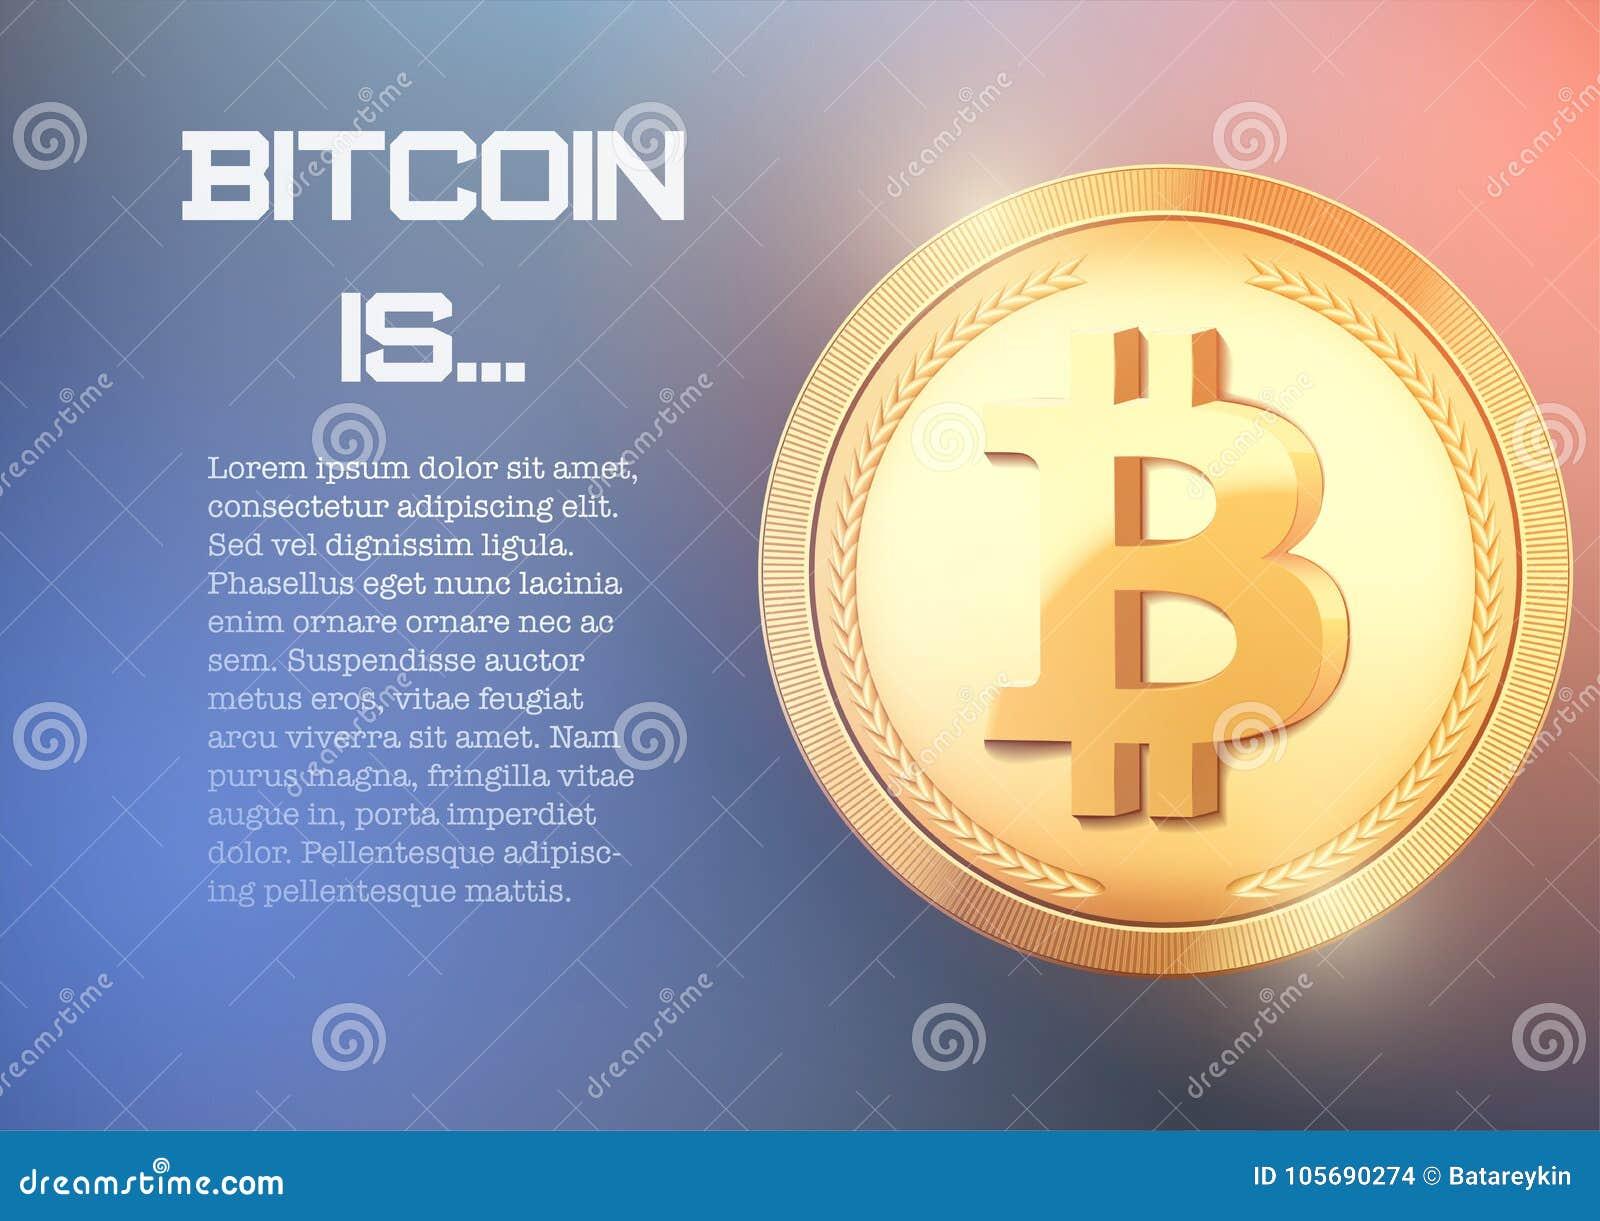 Bitcoin Information